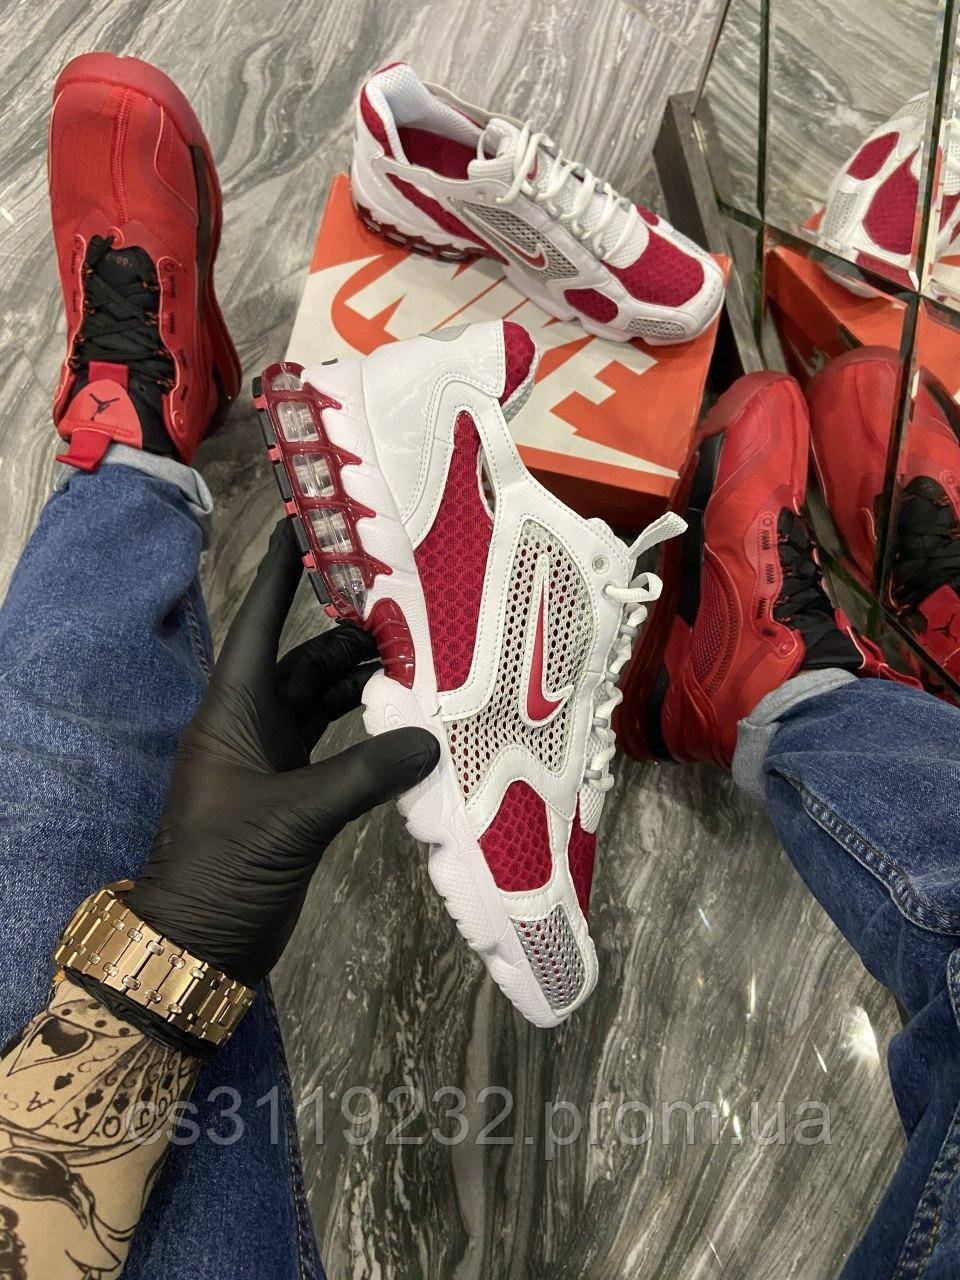 Мужские кроссовки Nike Air Zoom Spiridon Cage 2 Stussy White Red (белый/красный)